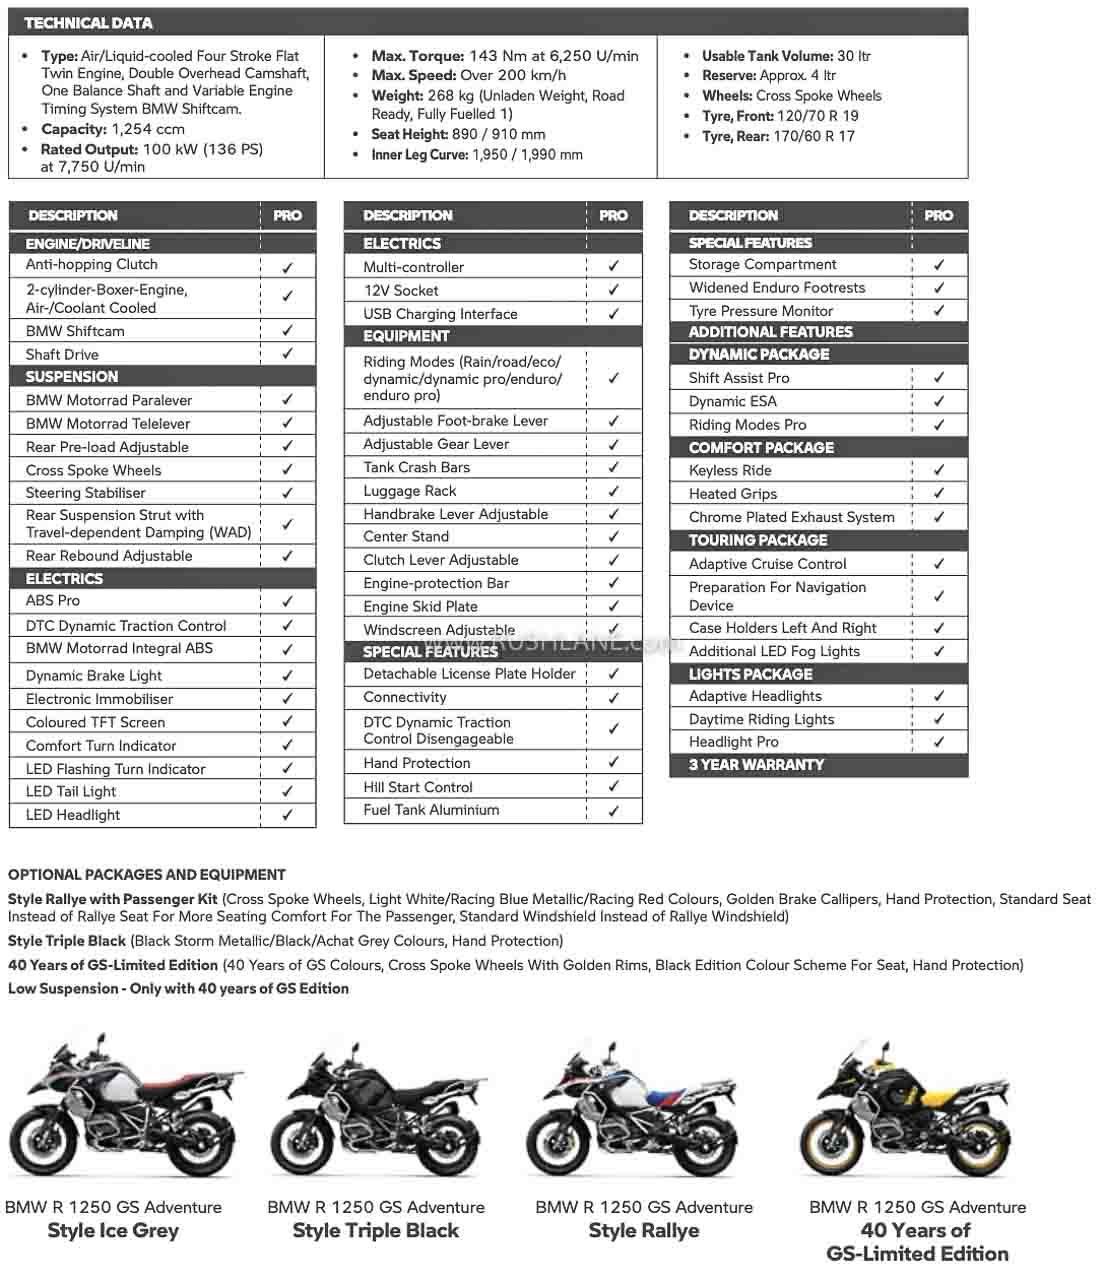 2021 BMW R 1250 GS Adventure Specs / Features